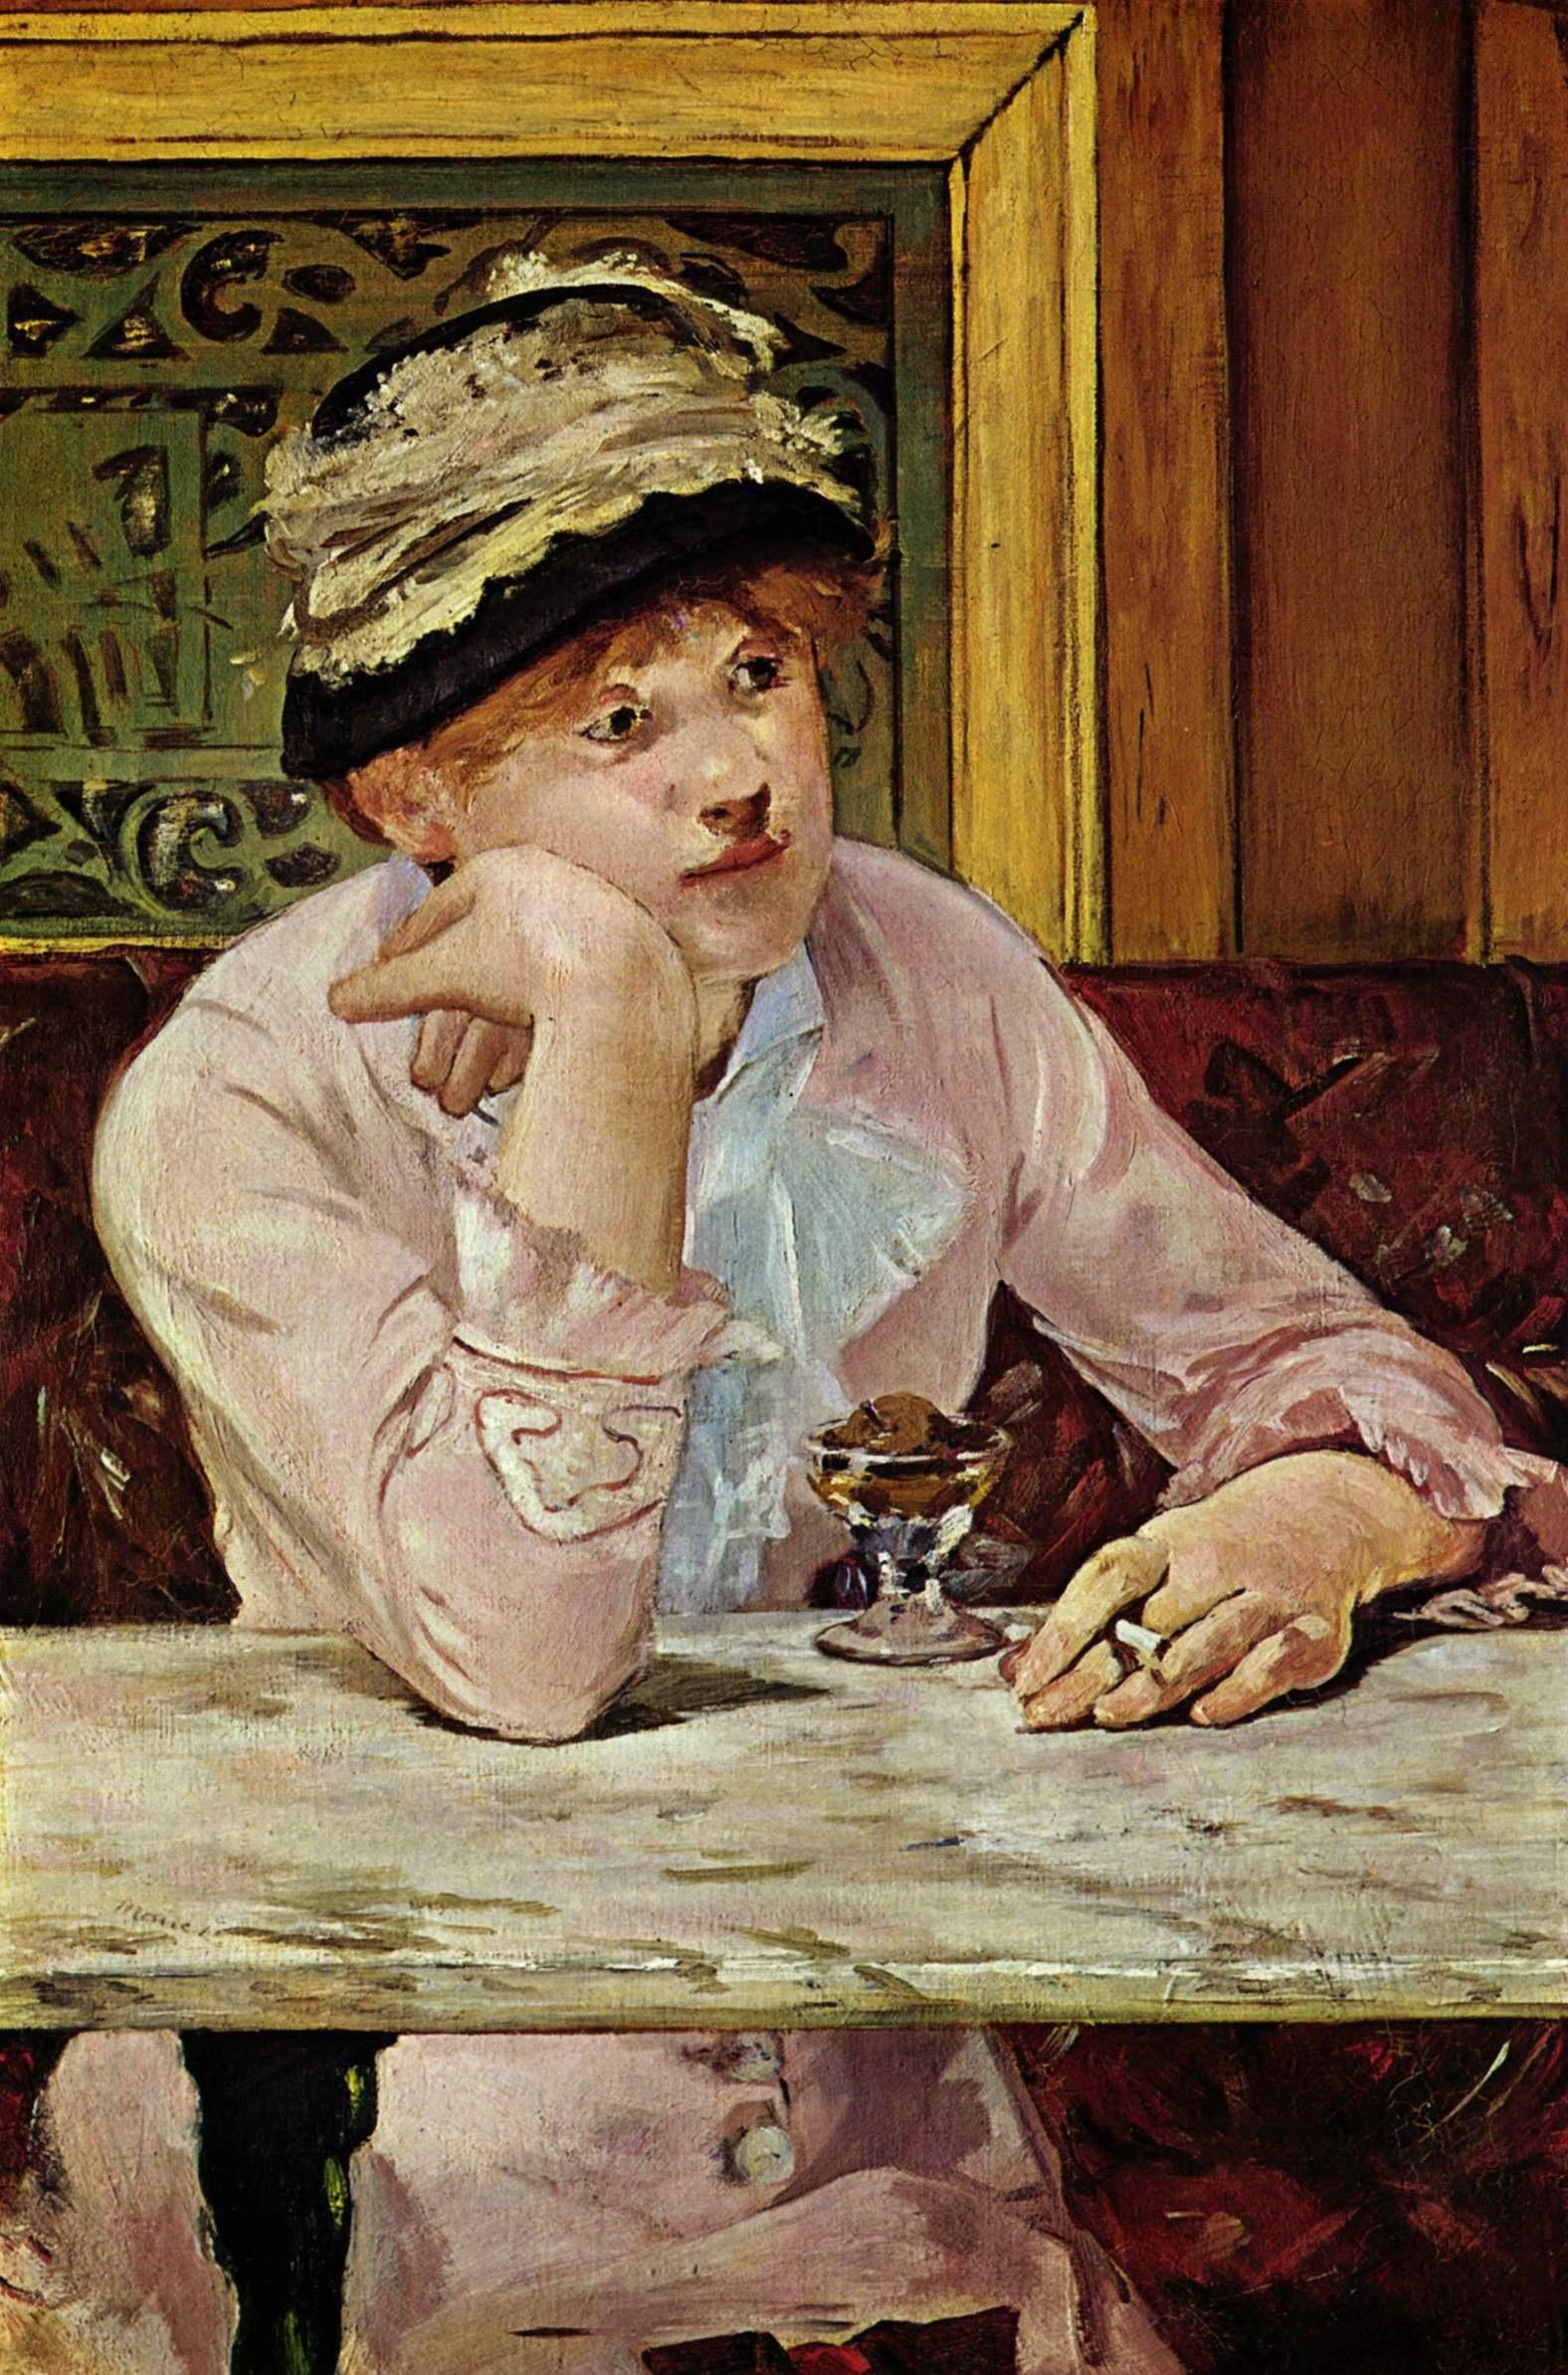 Edouard_Manet plum